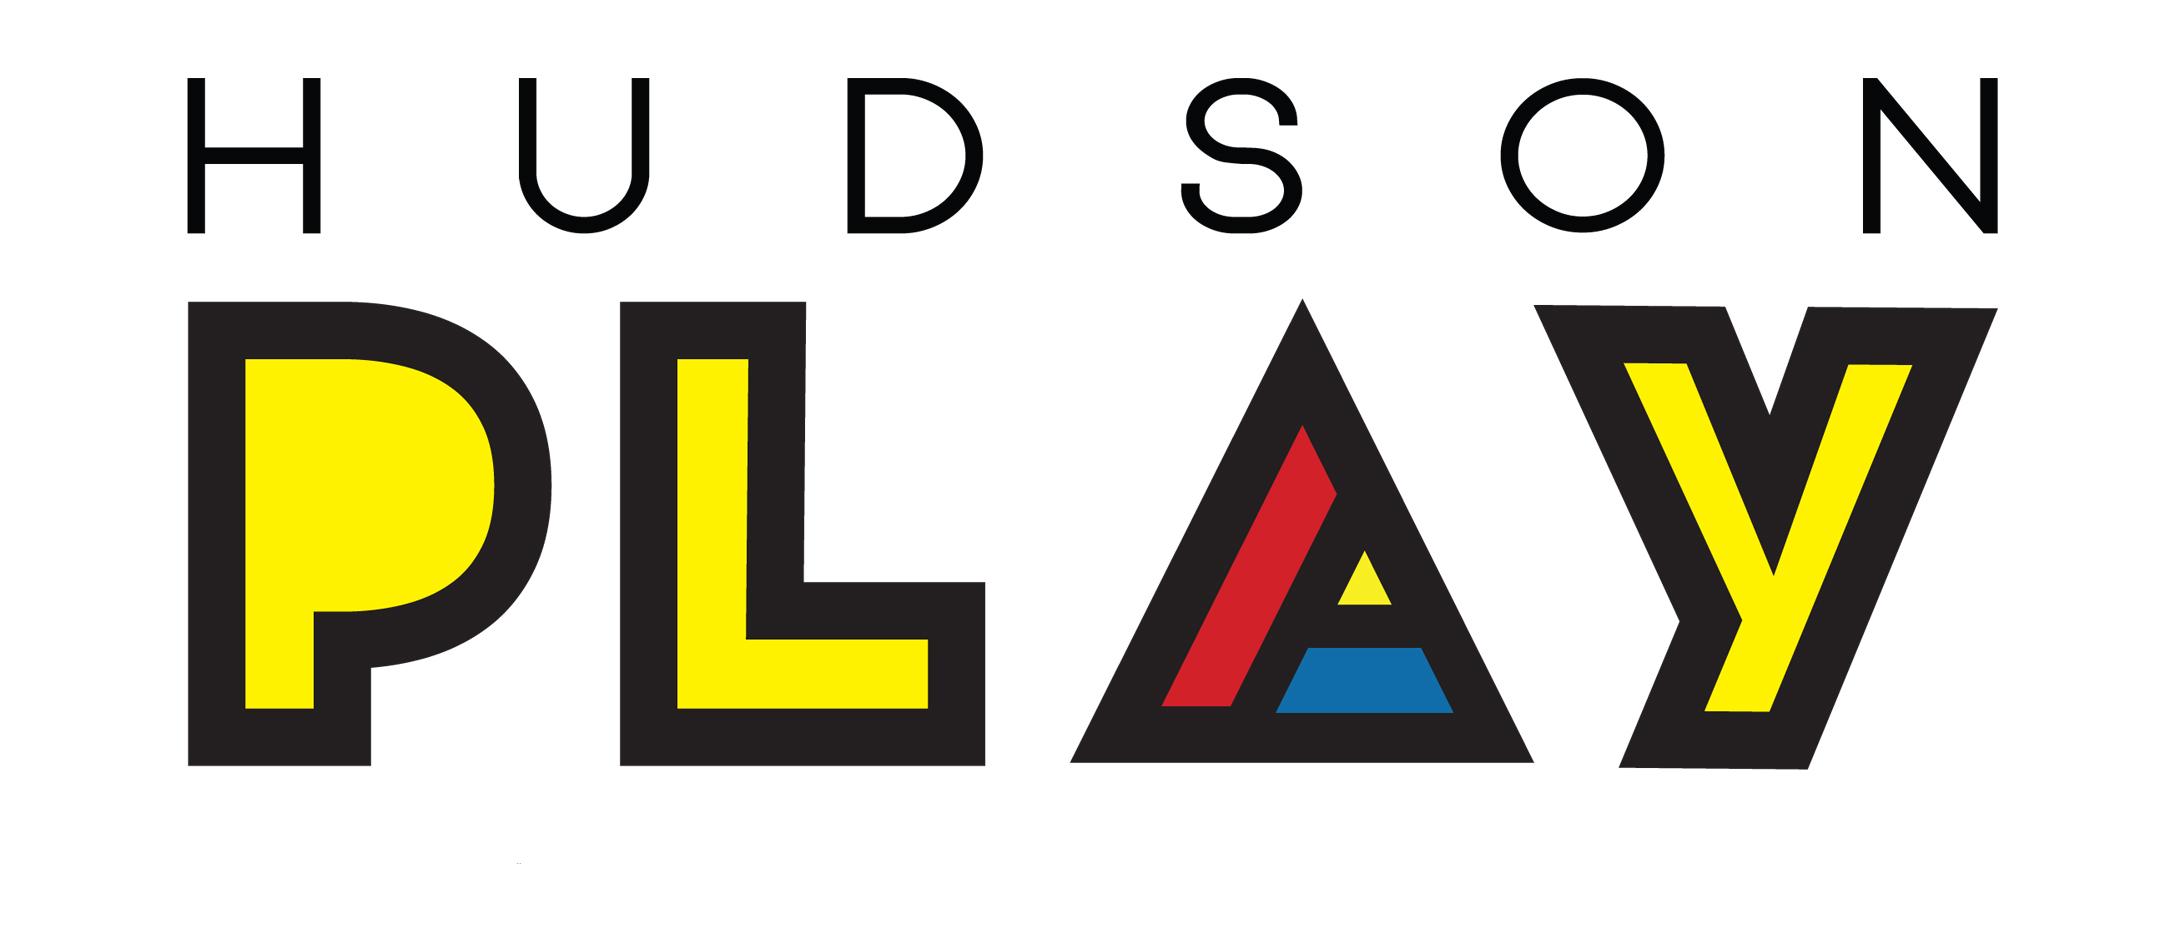 Hudson Play